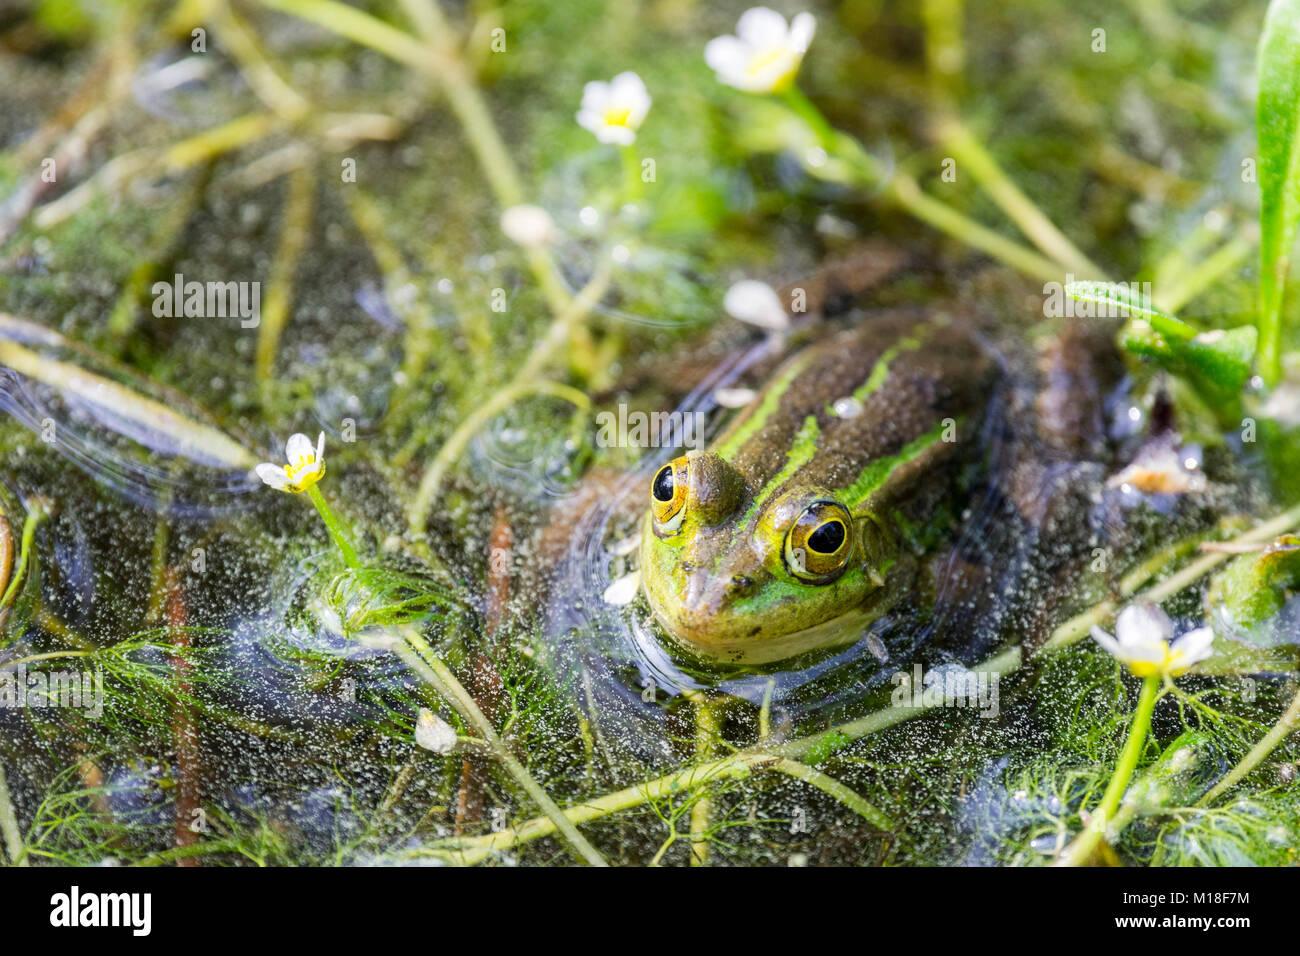 Green frog (Rana esculenta) between flowering aquatic plants,River water crowfoot (Ranunculus fluitans),Veneto,Italy - Stock Image